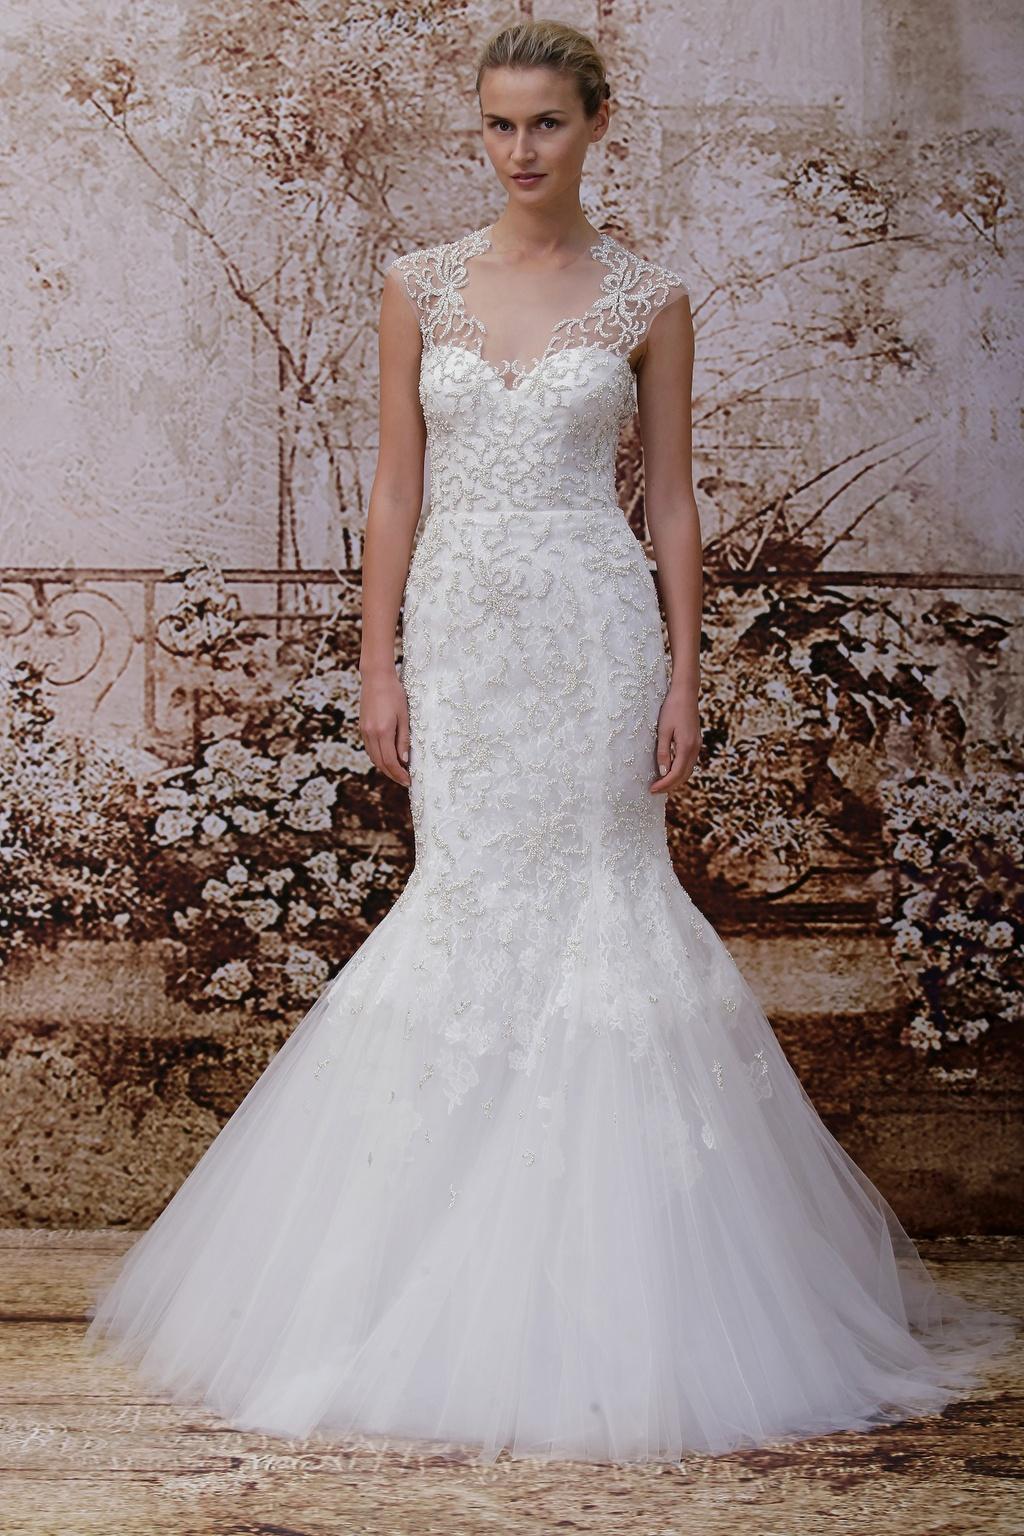 Wedding-dress-by-monique-lhuillier-fall-2014-bridal-look-26.full